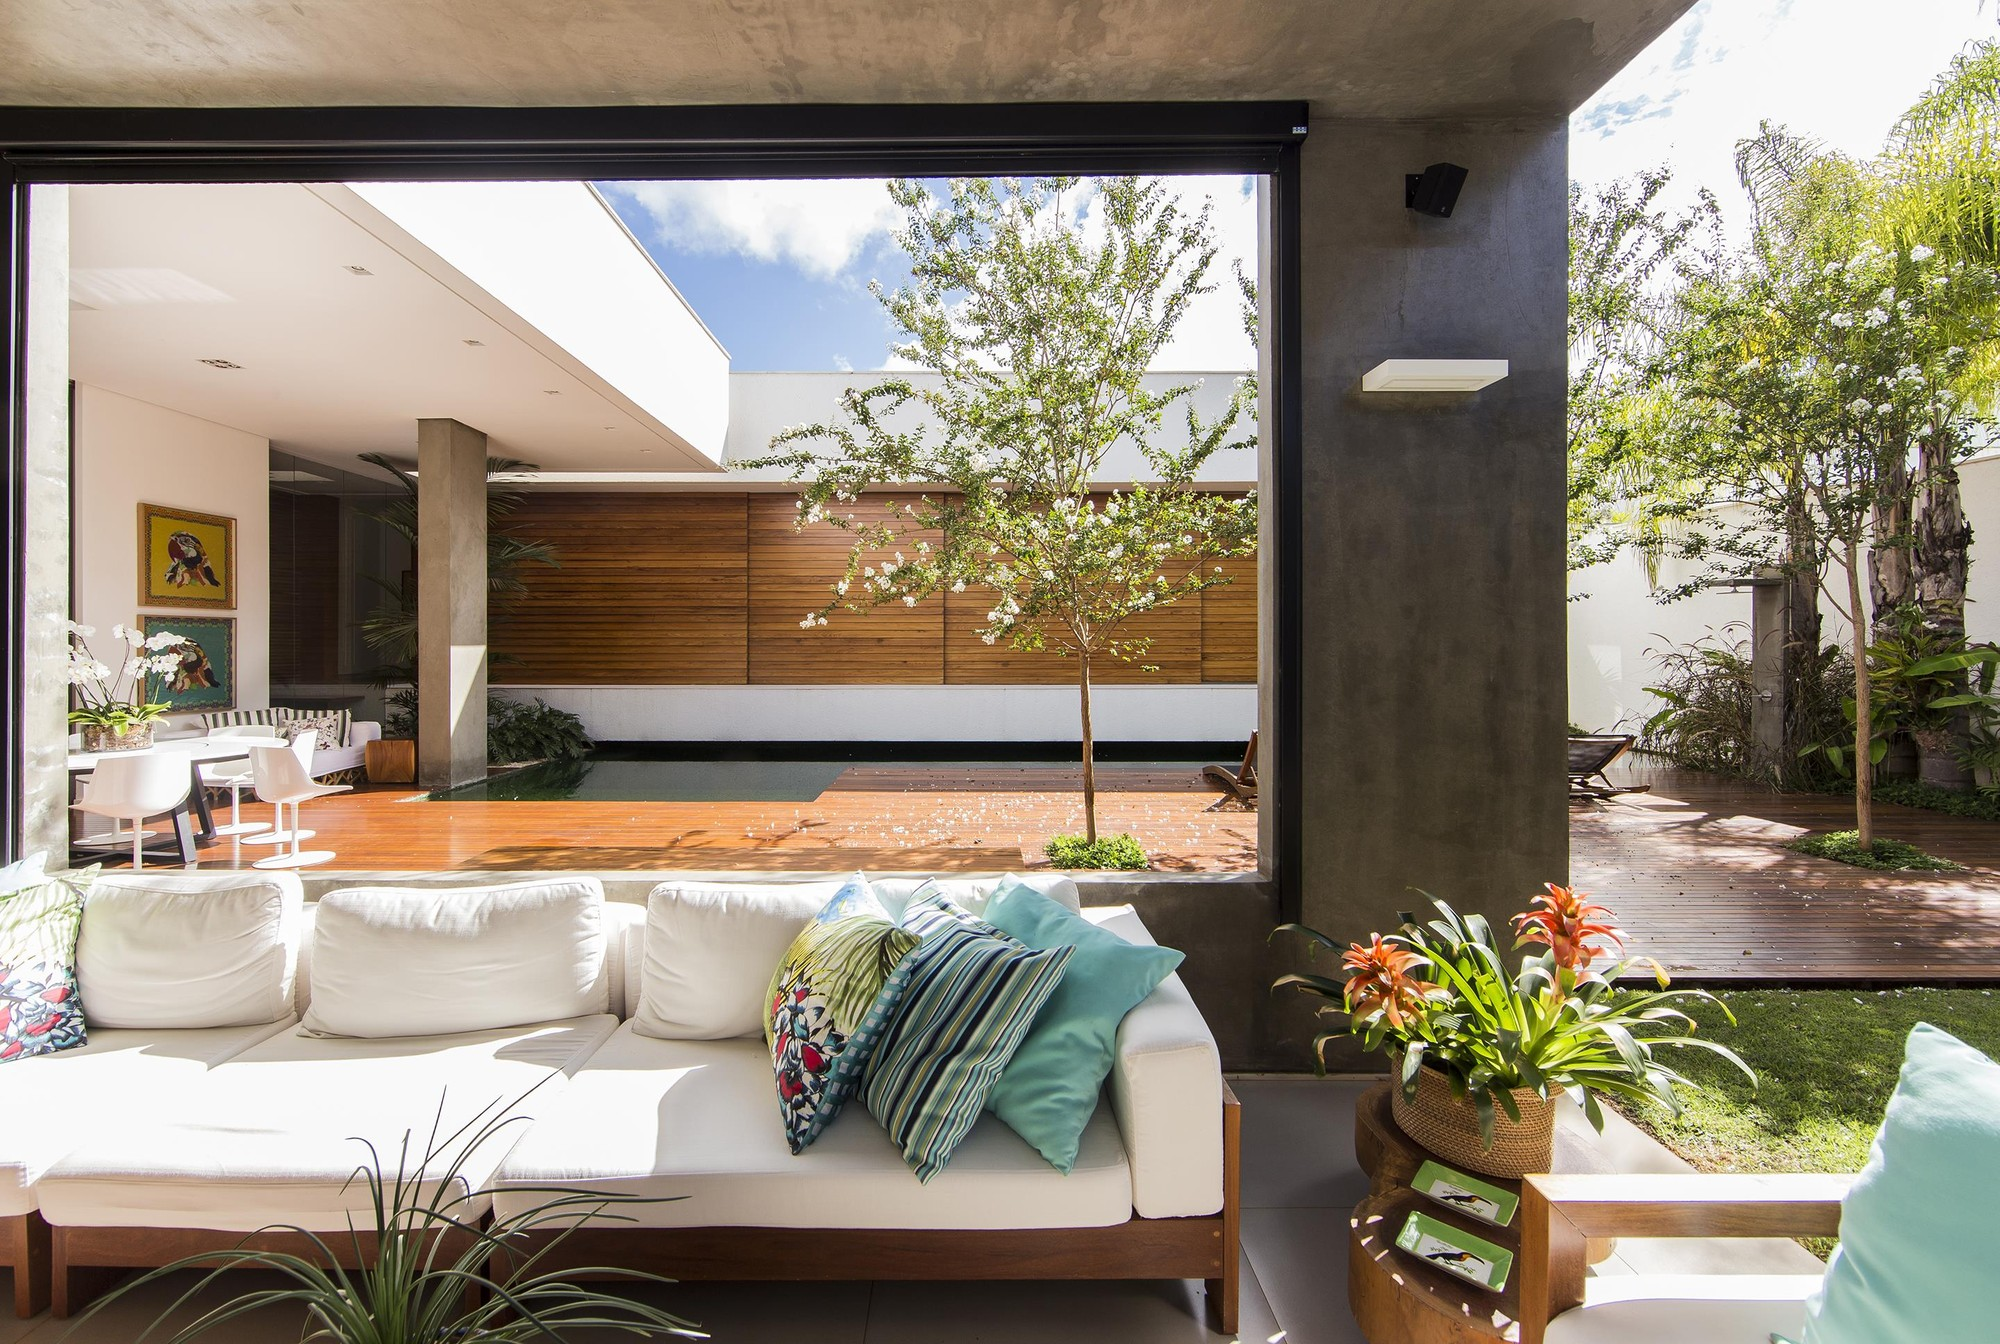 Residência RMJ / Felipe Bueno & Alexandre Bueno